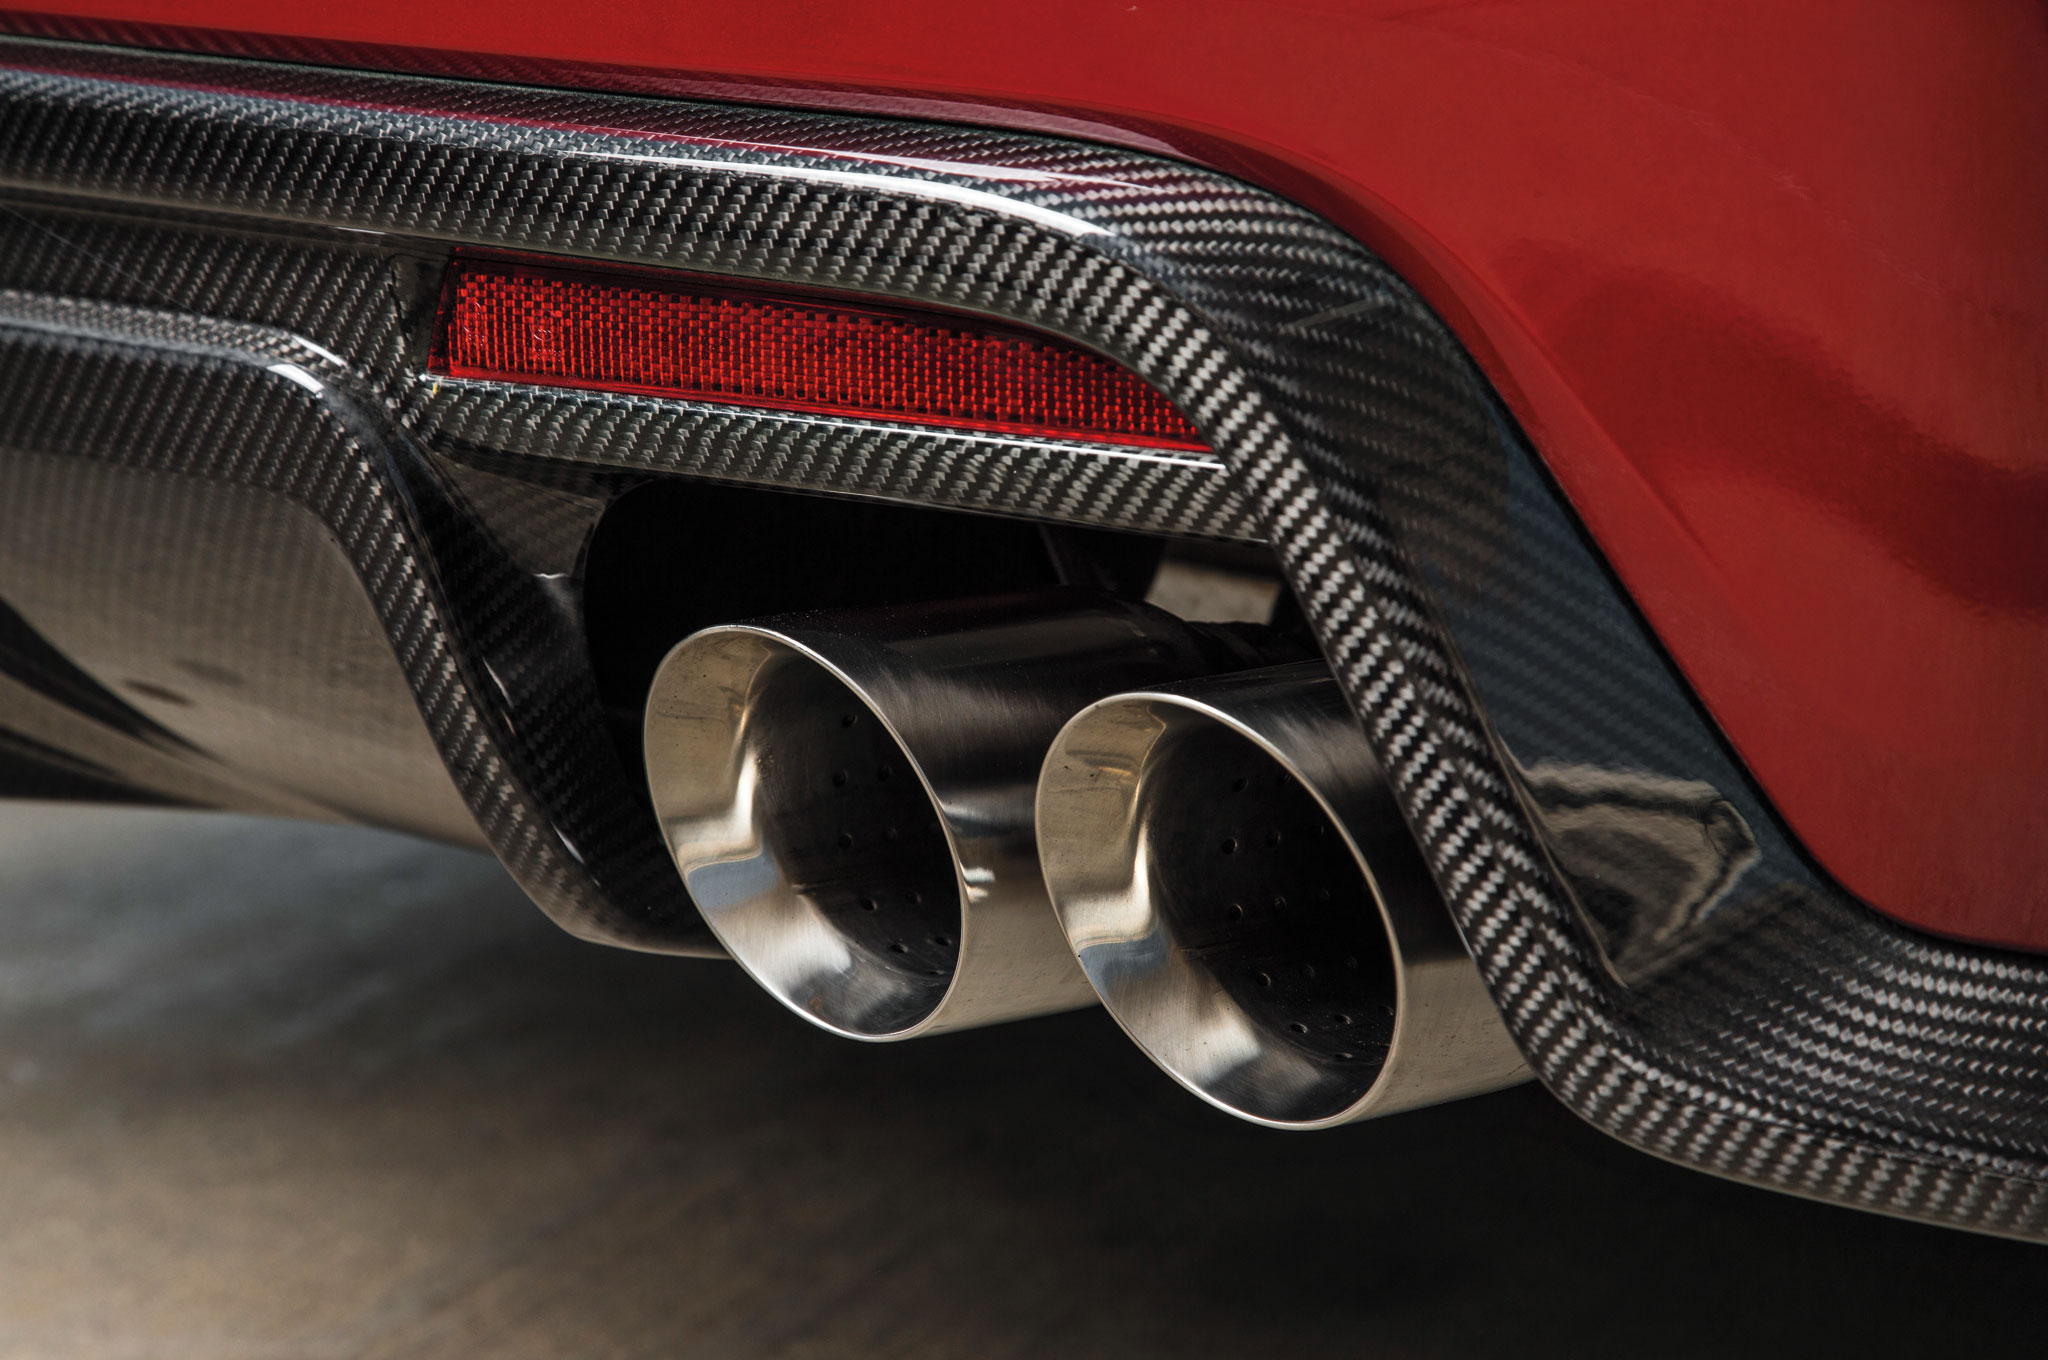 2016 Cadillac Cts V Sedan Exhaust